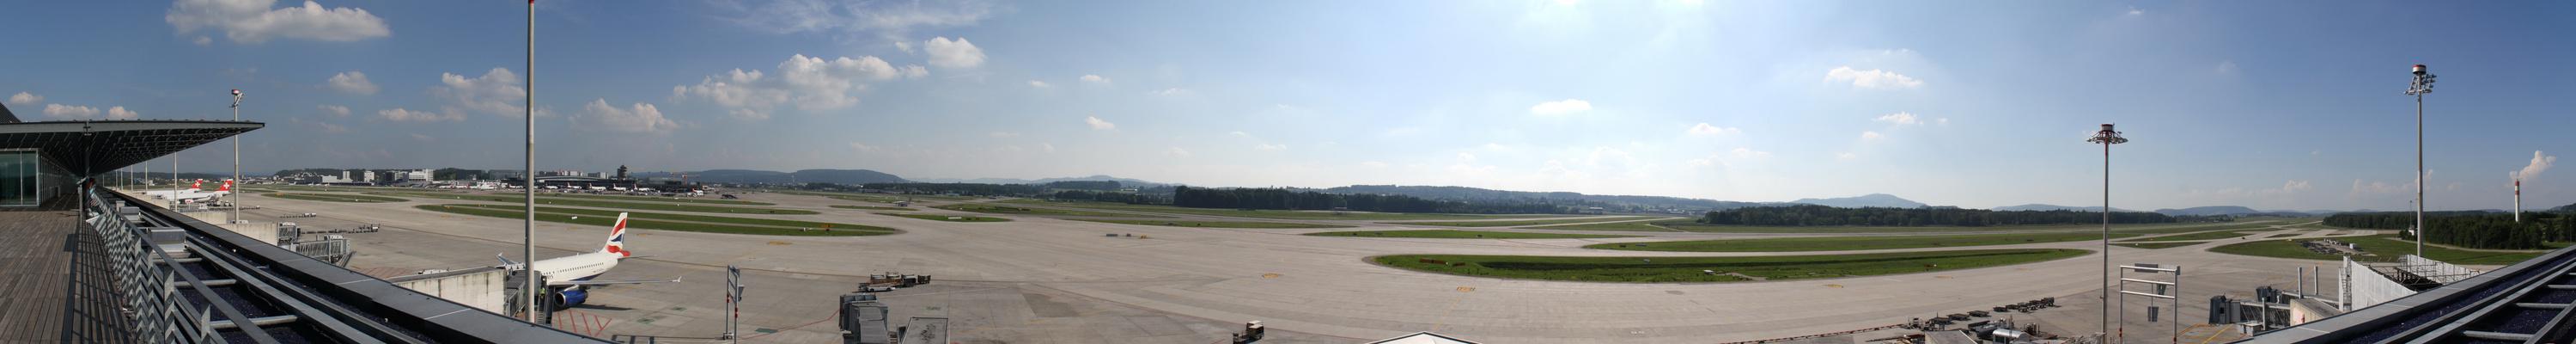 Panorama Flughafen